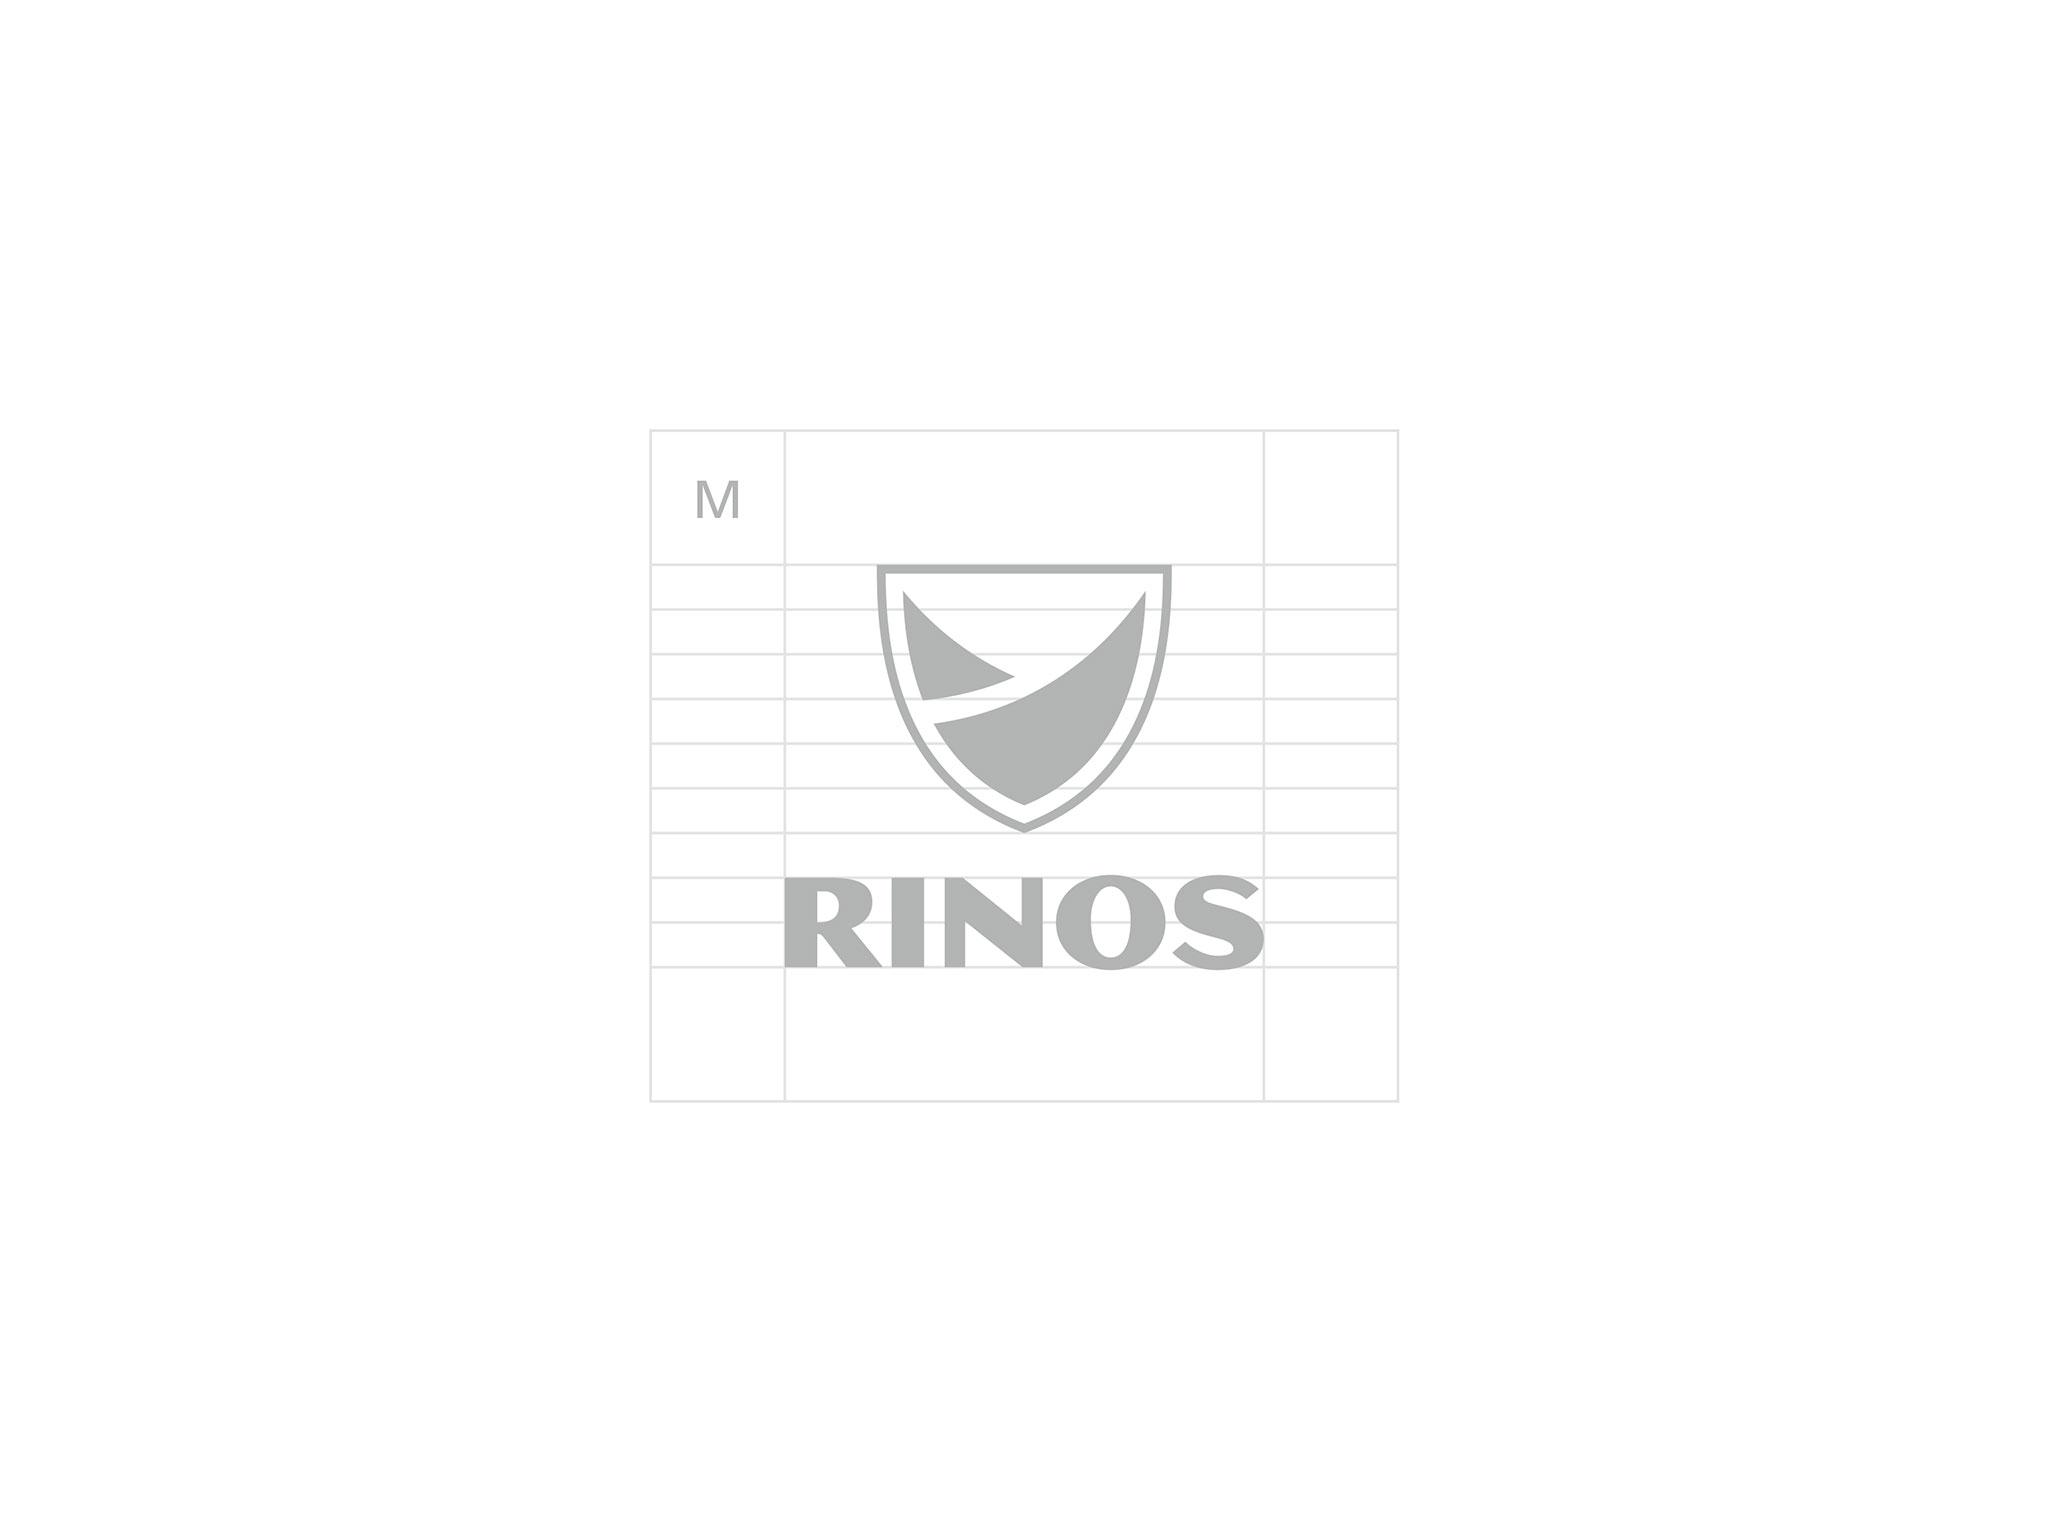 RINOS_LOGO_M